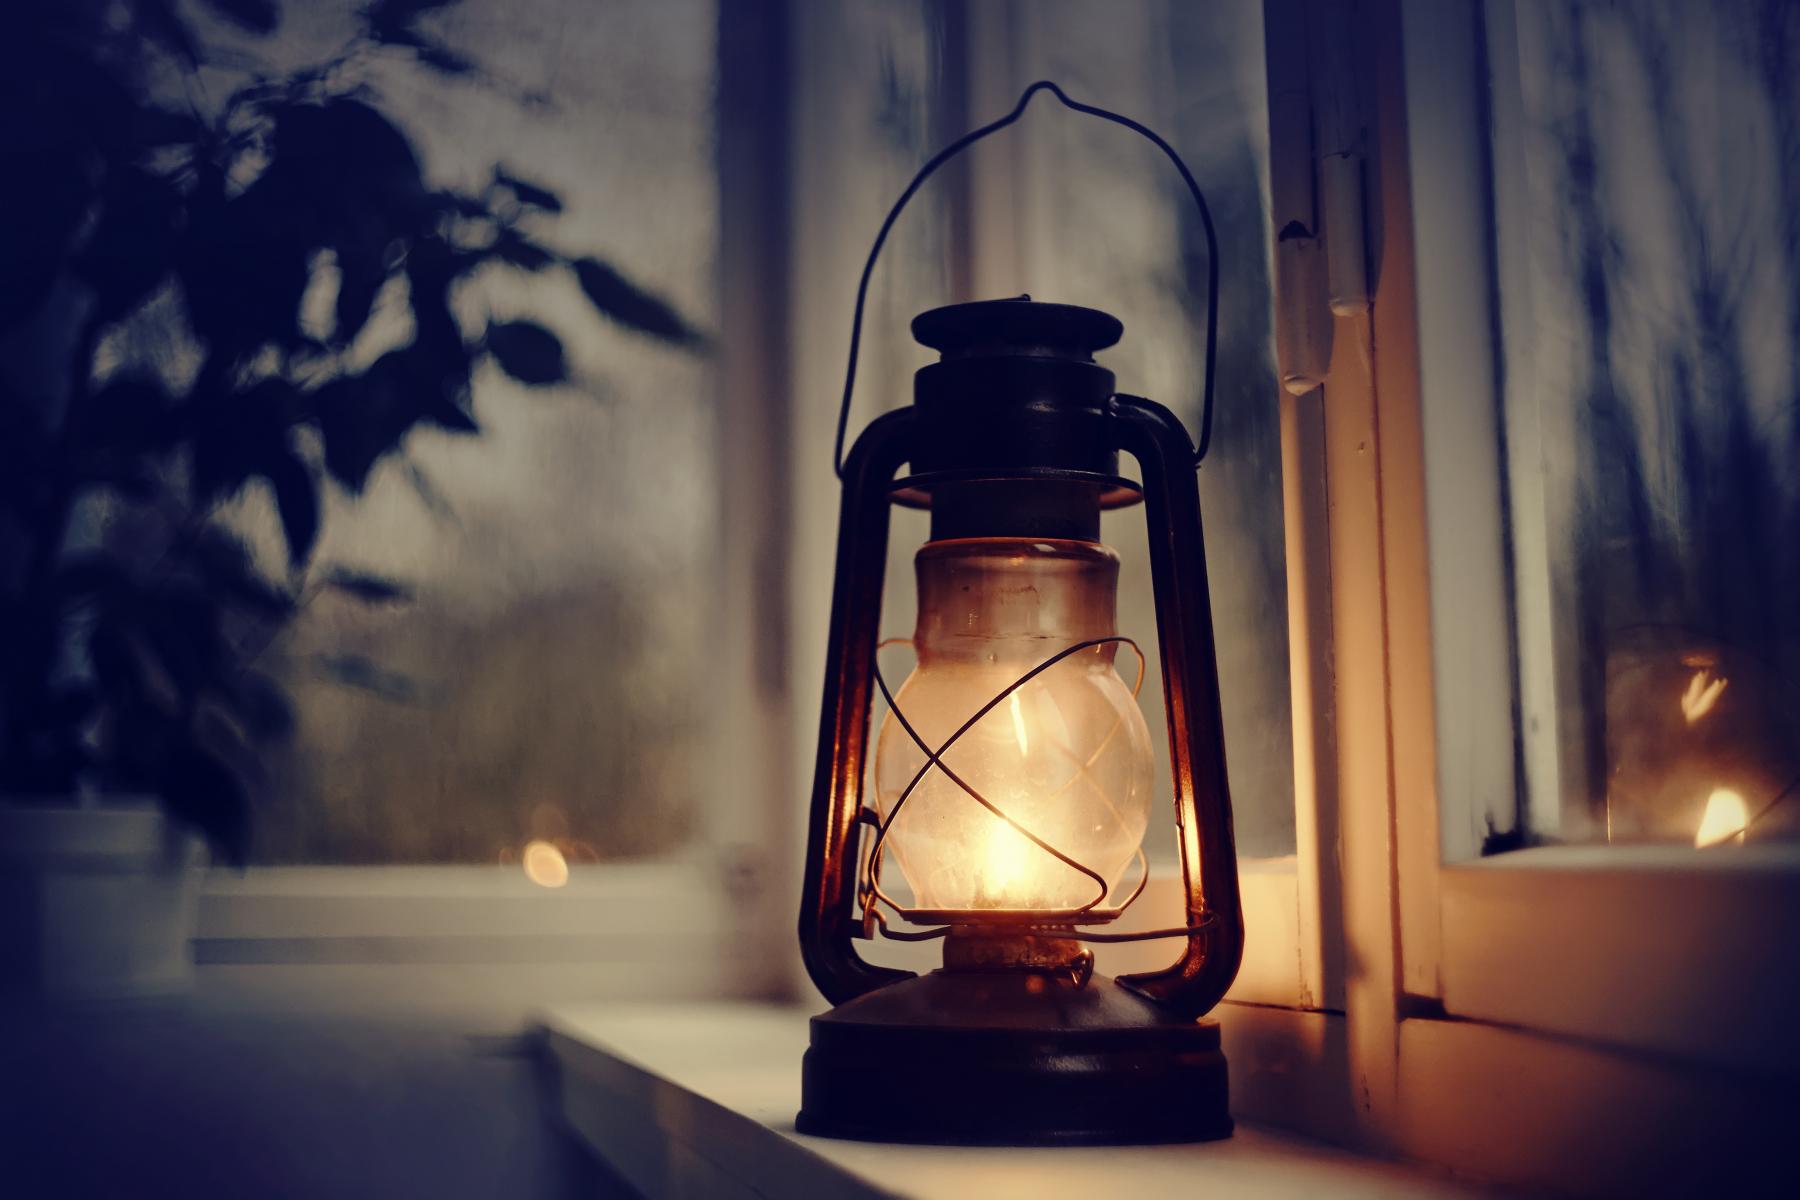 Brennende parafinlampe i vinduspost